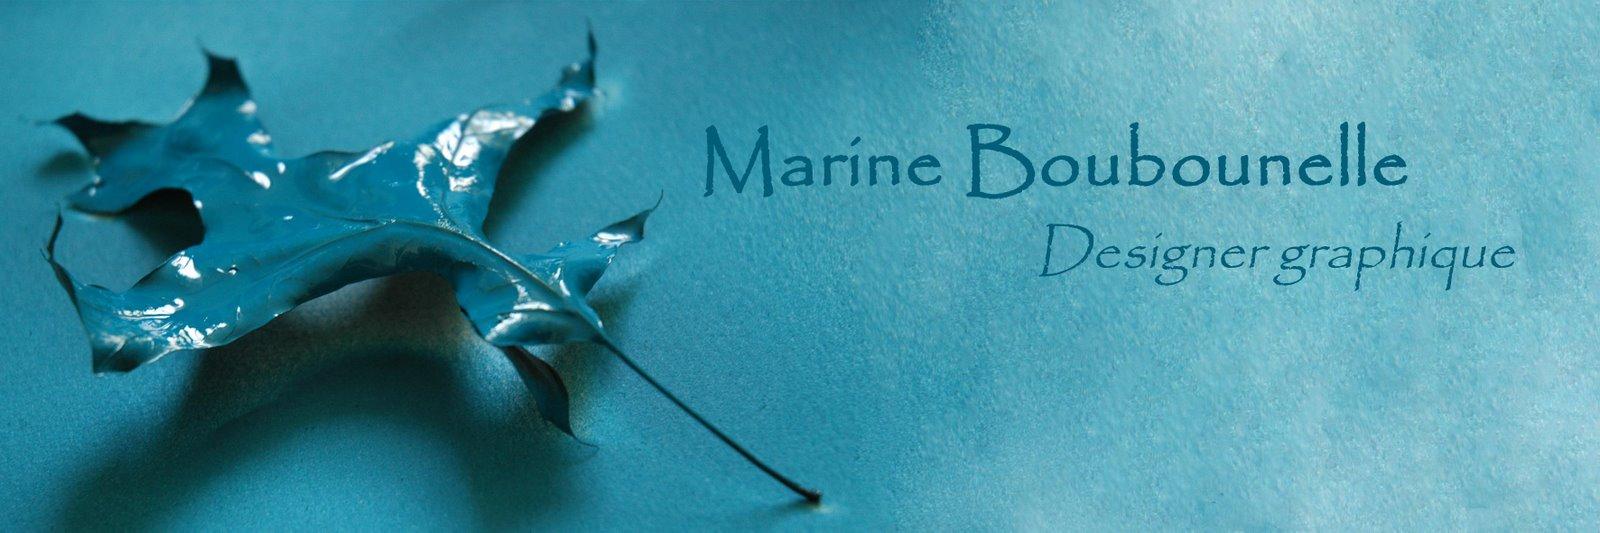 marine boubounelle